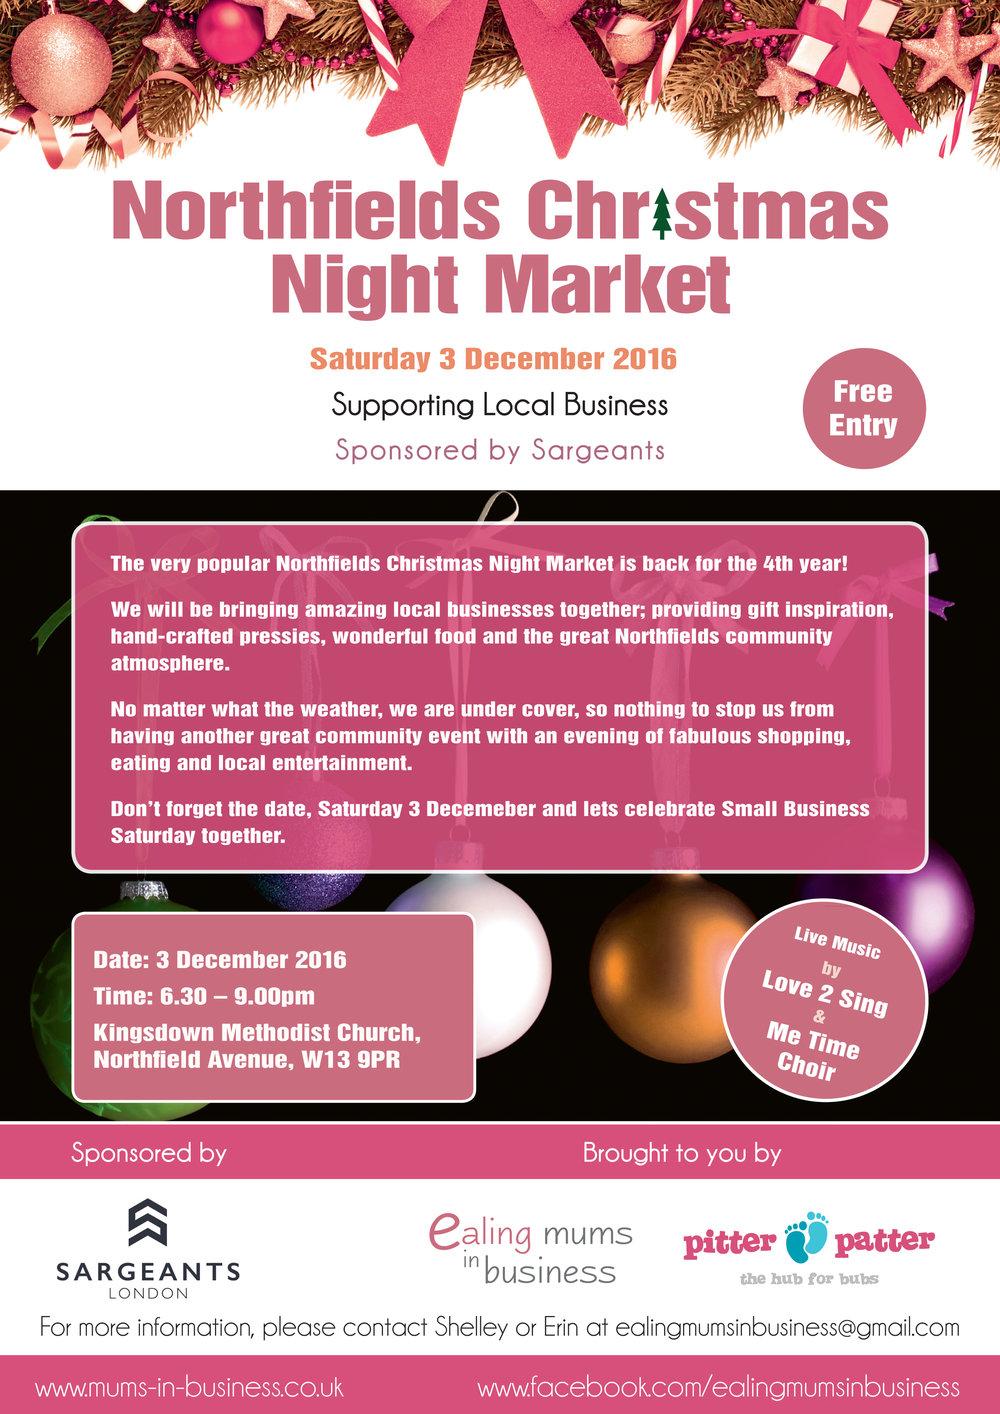 Northfields Christmas Night Market - Saturday 3rd December